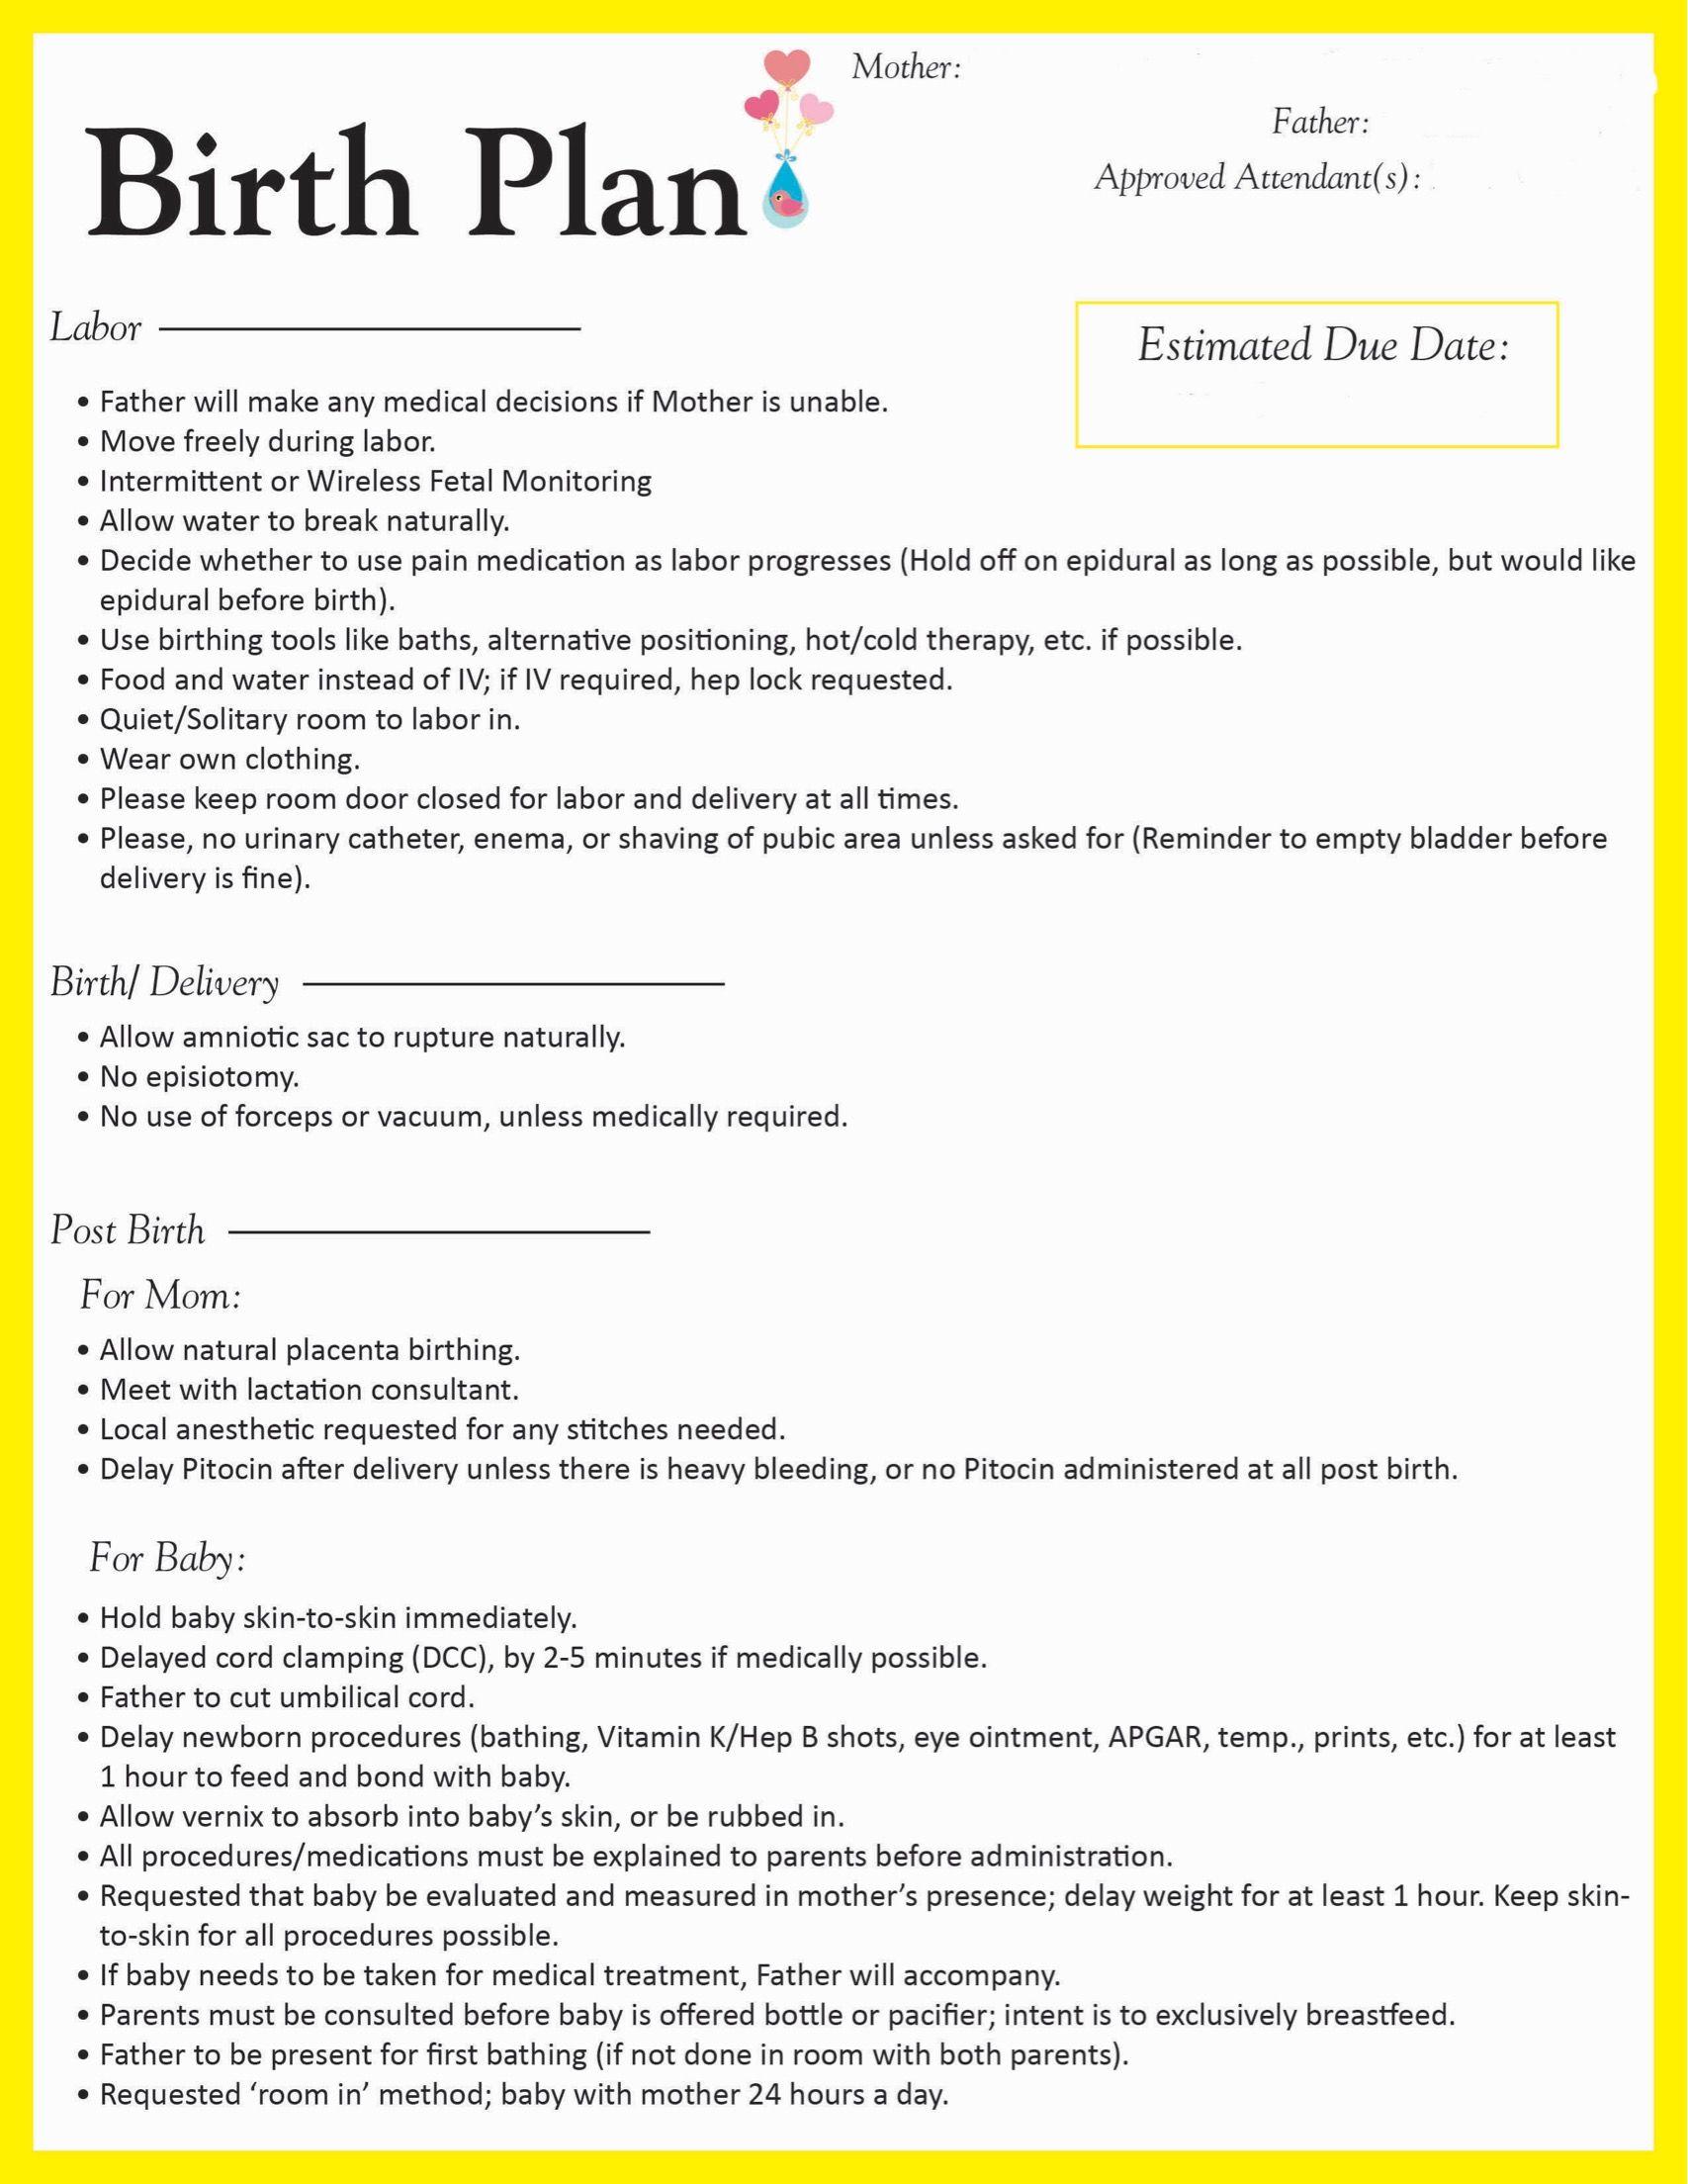 Ncci Edits Worksheet